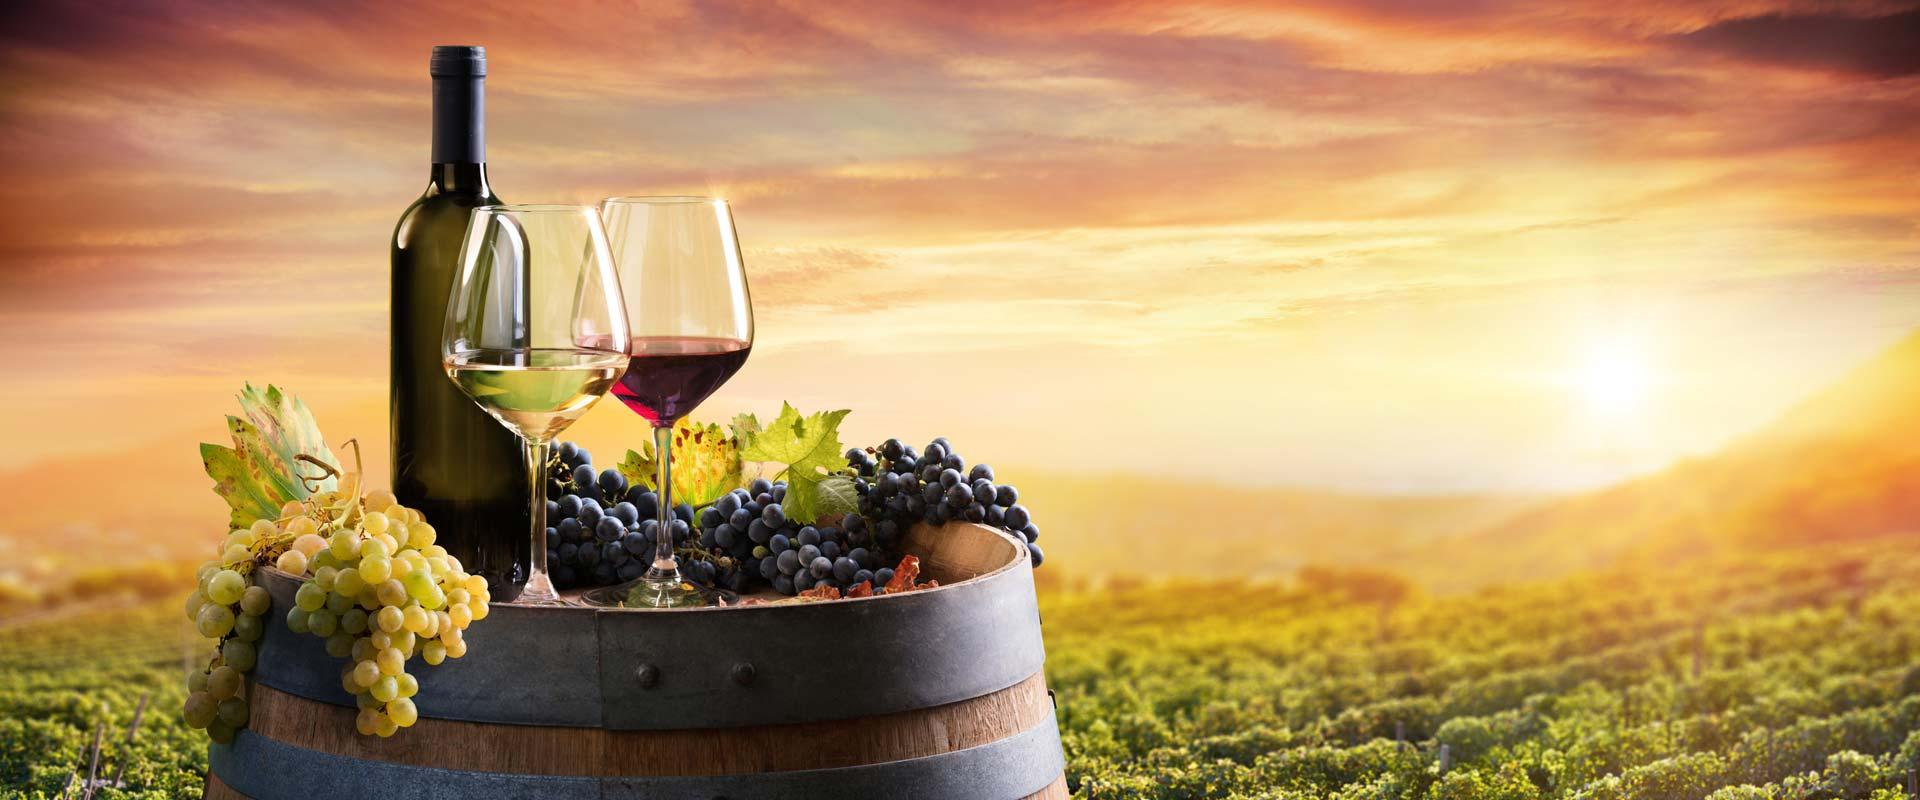 touring-niagara-wineries-niagara-falls-canada